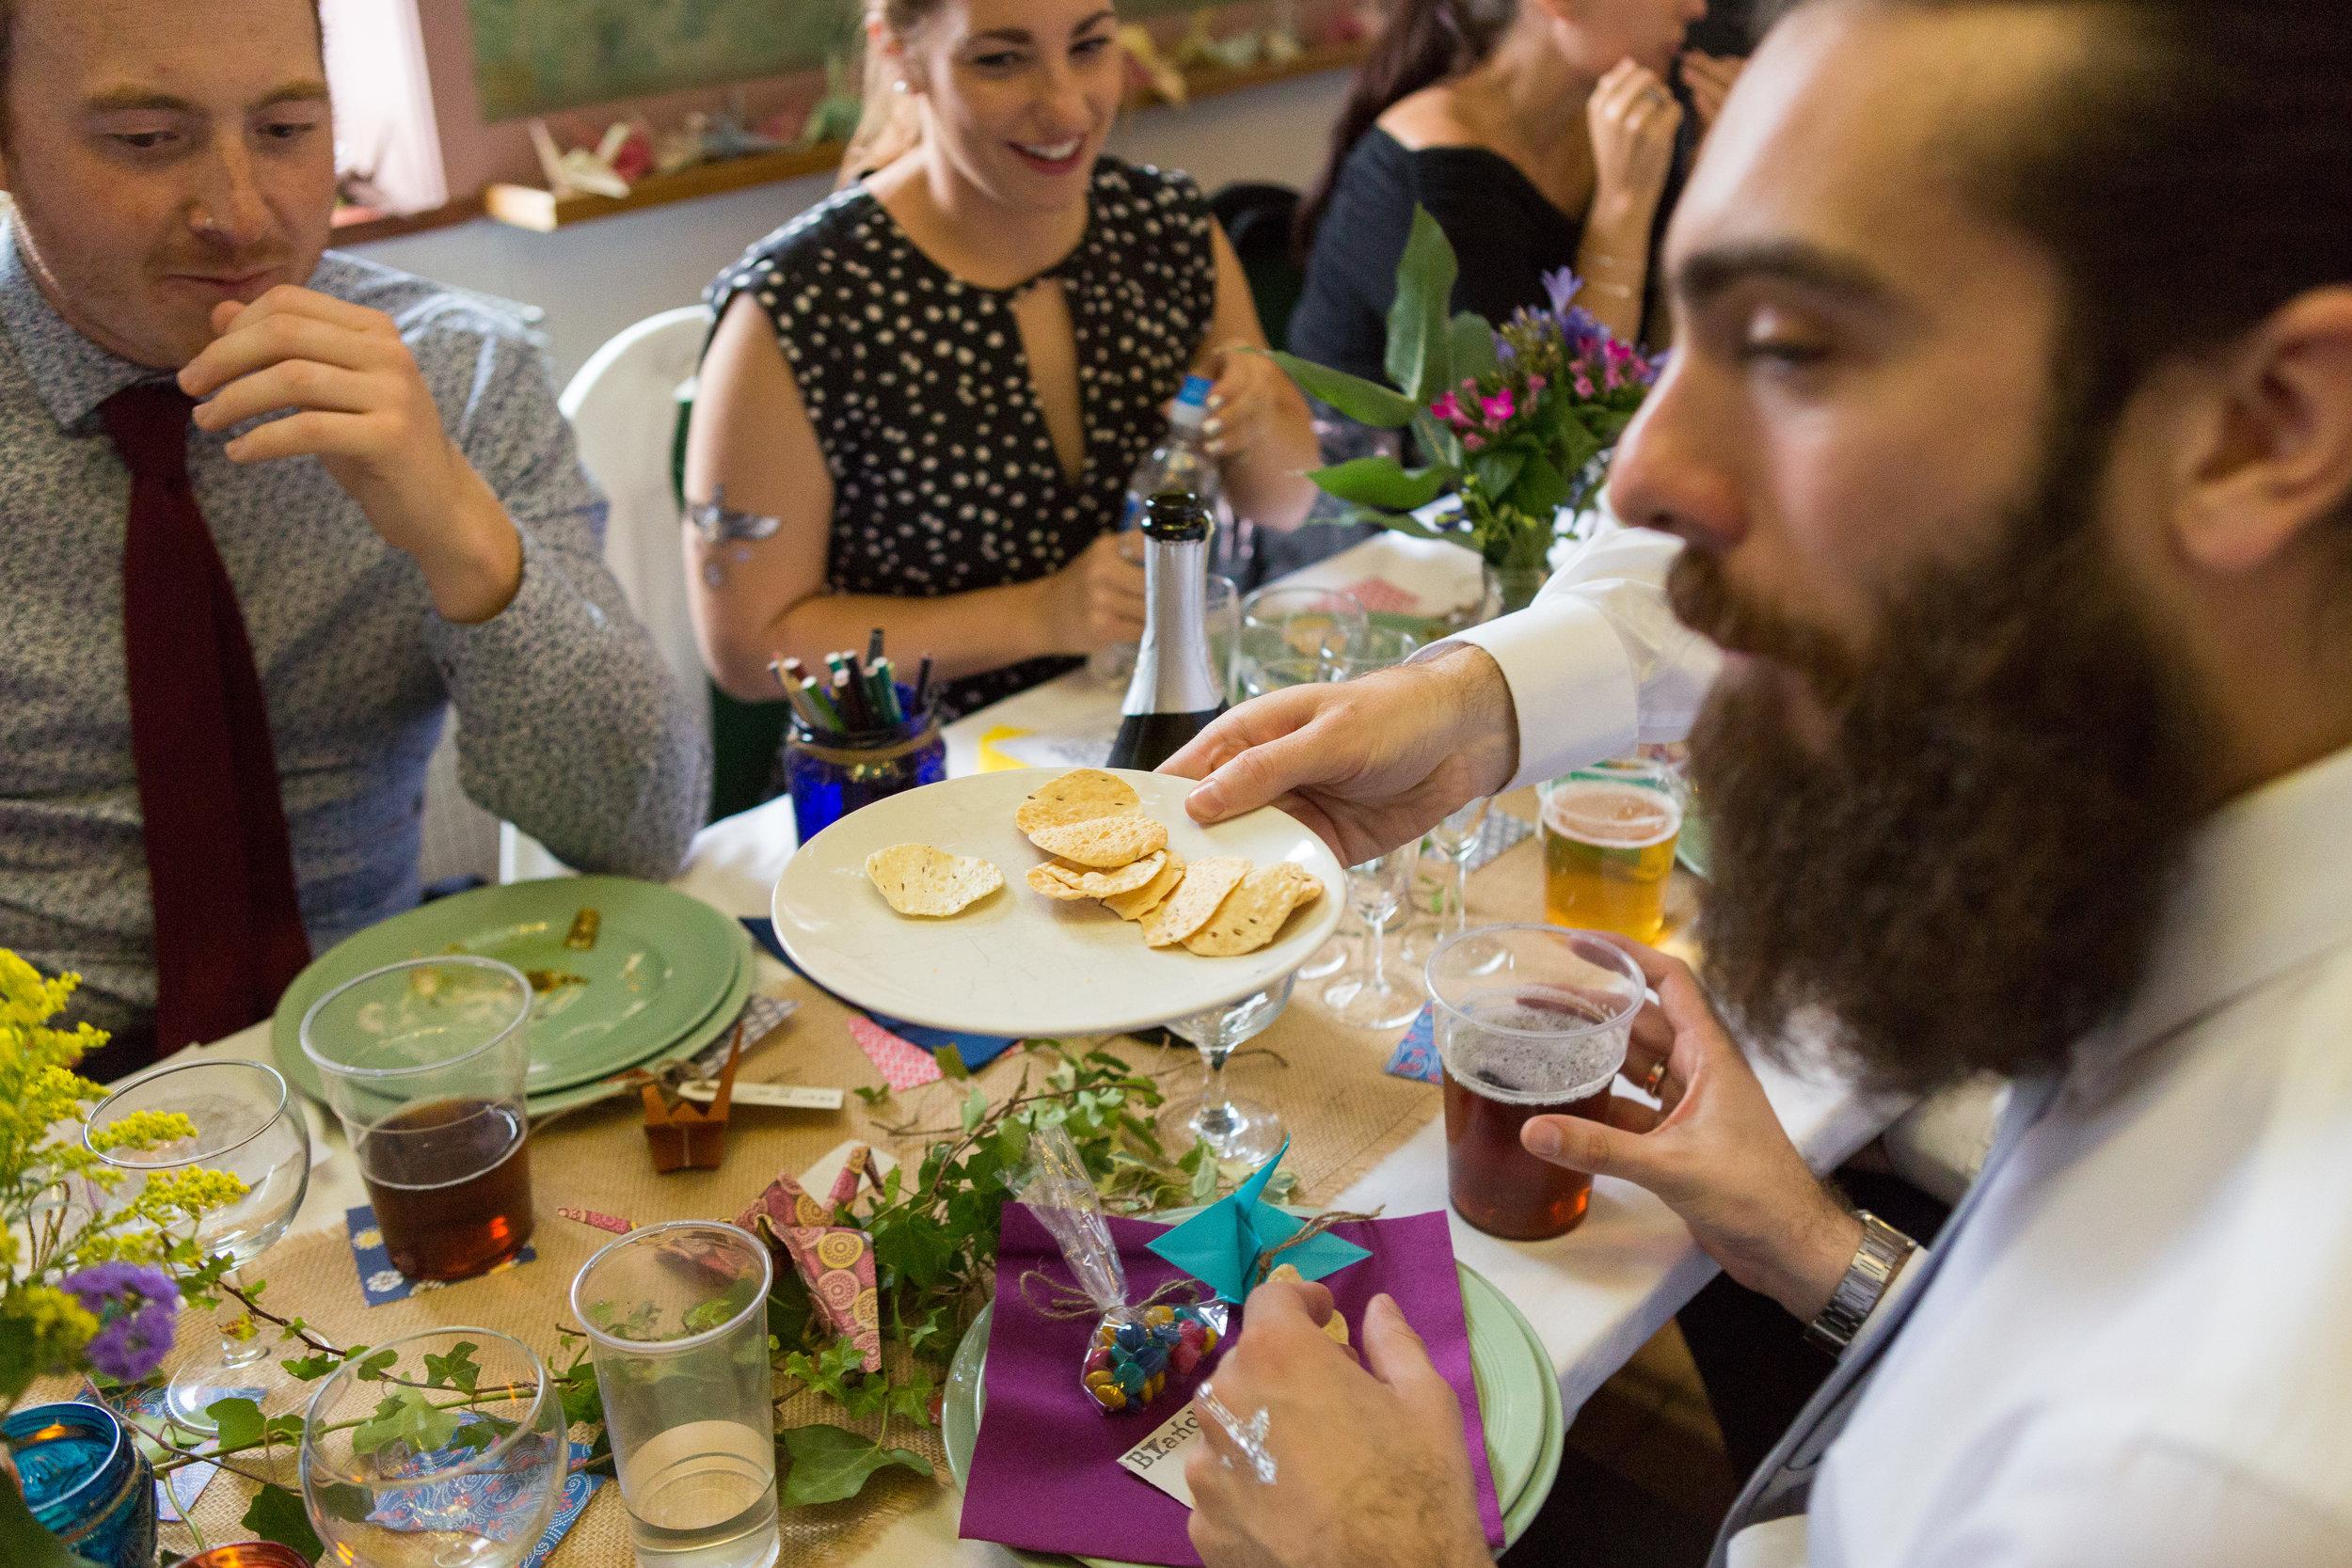 village-hall-wedding-inspiration / hampshire-village-hall-wedding / Sarah-fishlock-photography / wedding-photographer-hampshire